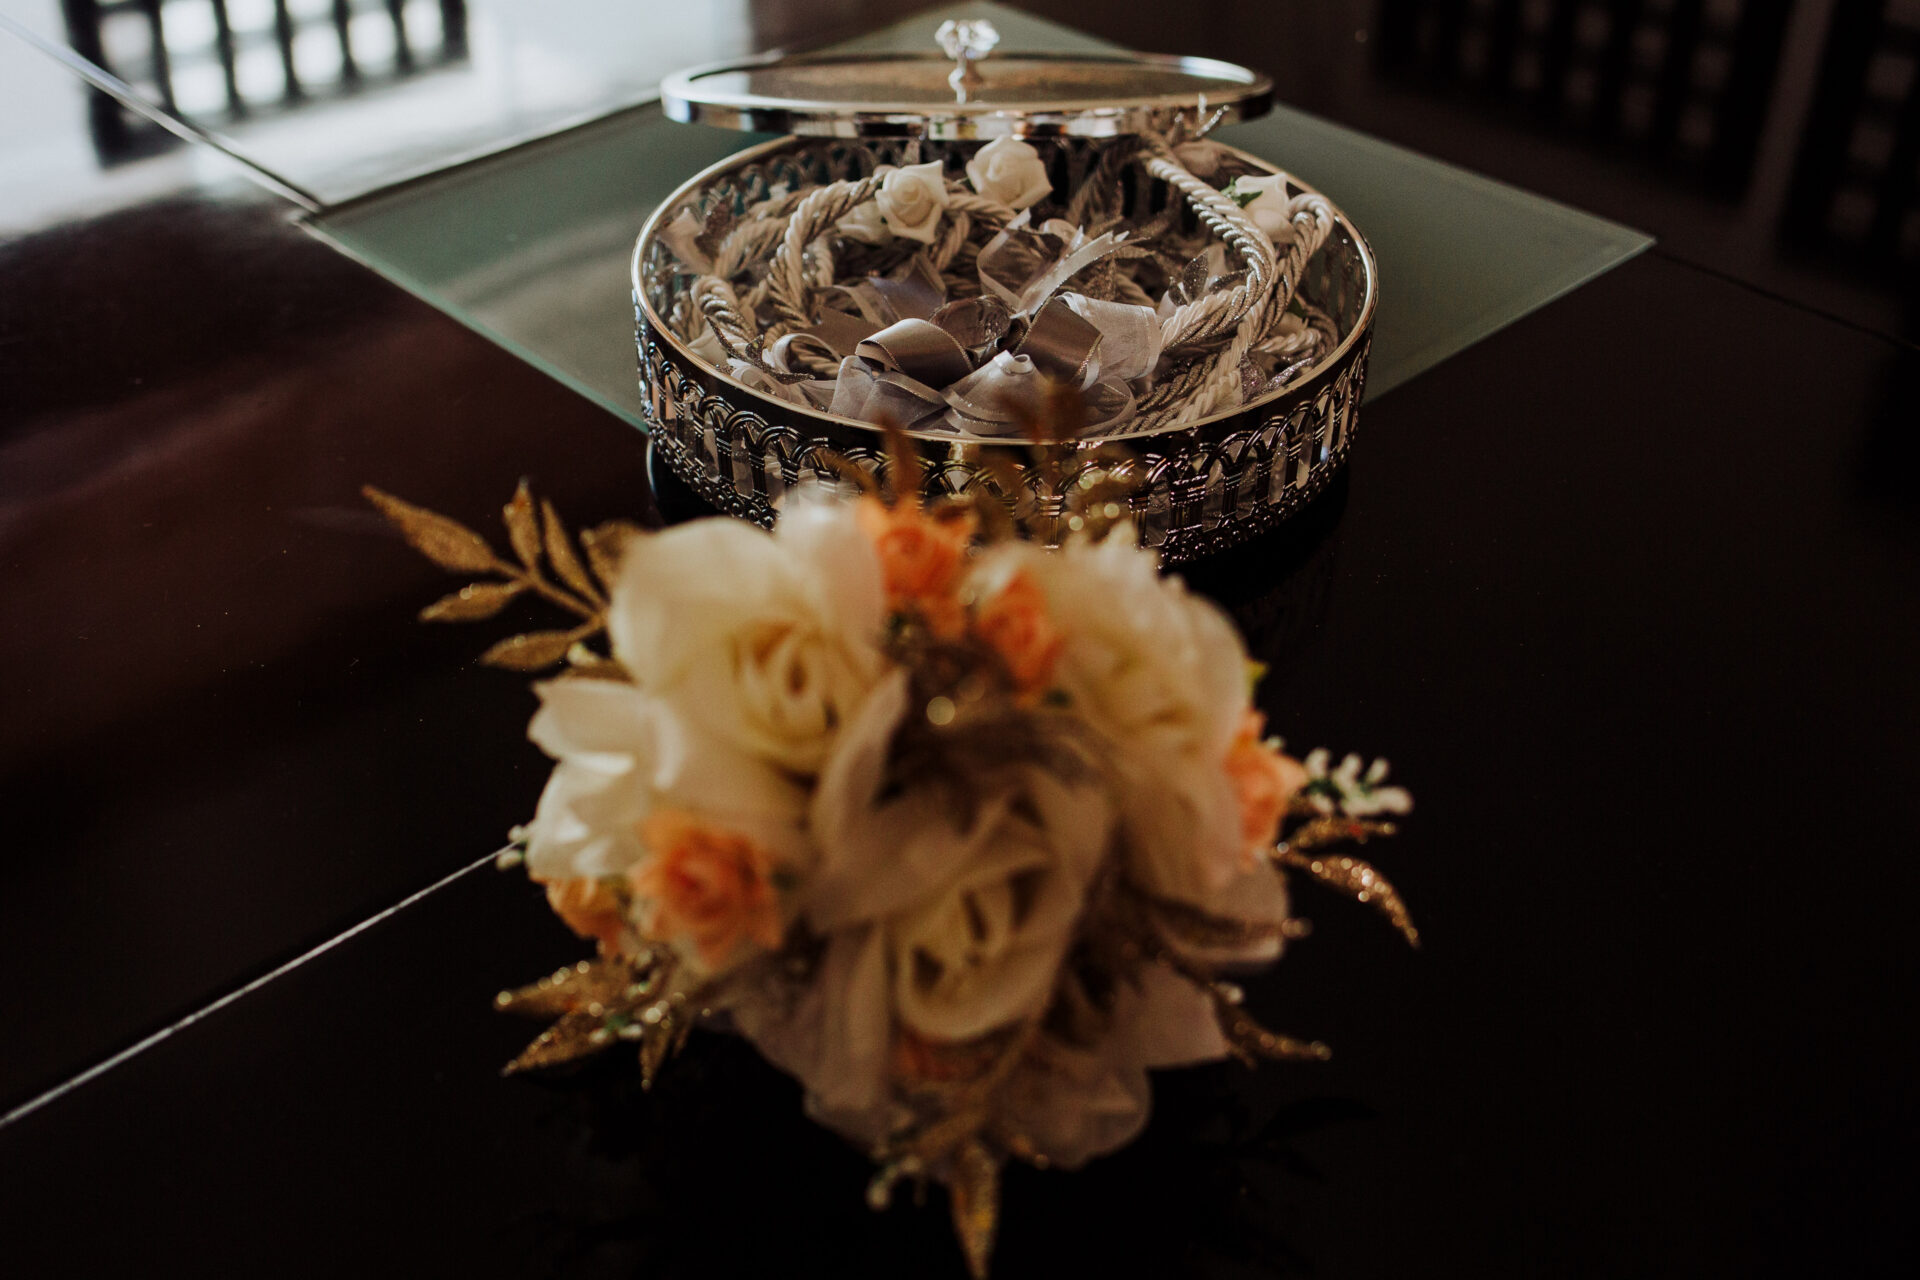 javier_noriega_fotografo_bodas_gaviones_zacatecas_wedding_photographer3